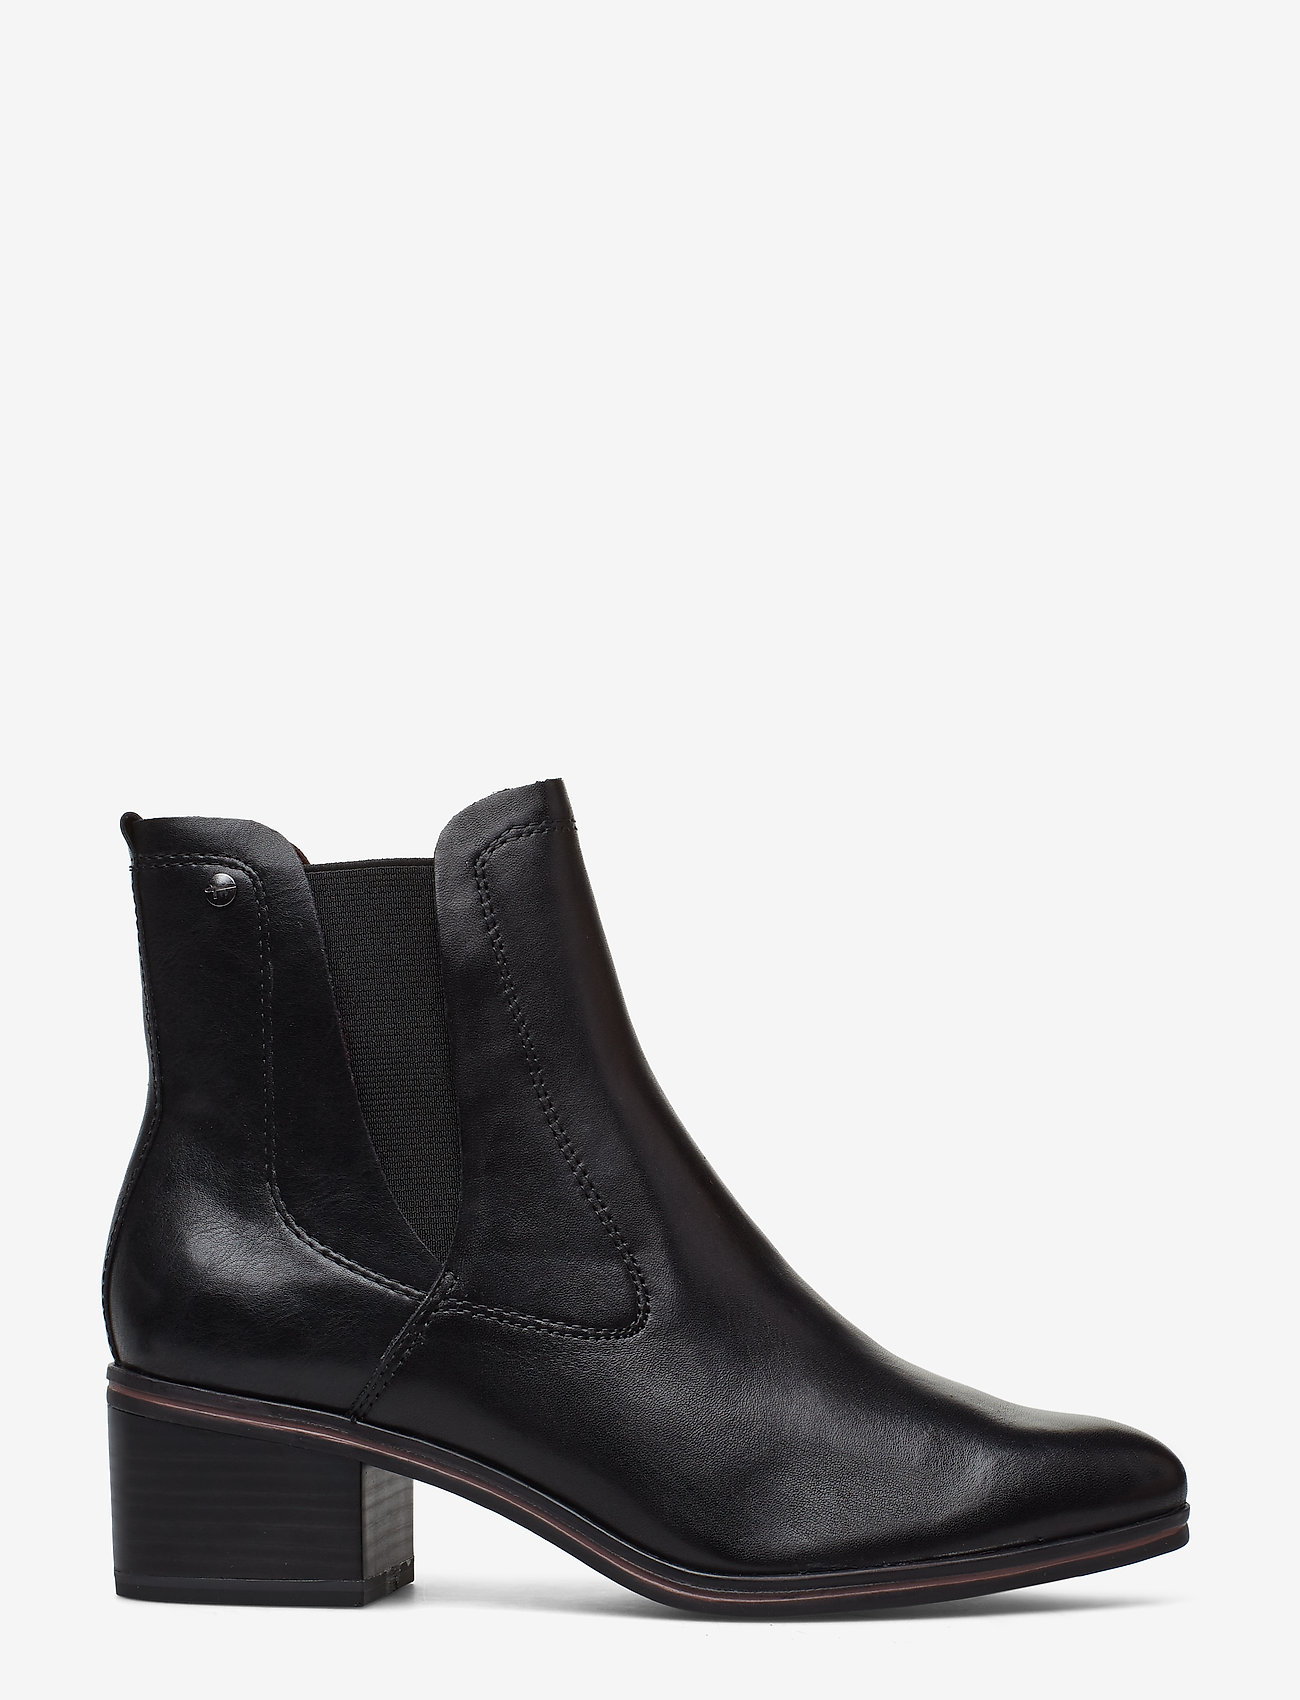 Tamaris - Boots - talon haut - black - 1